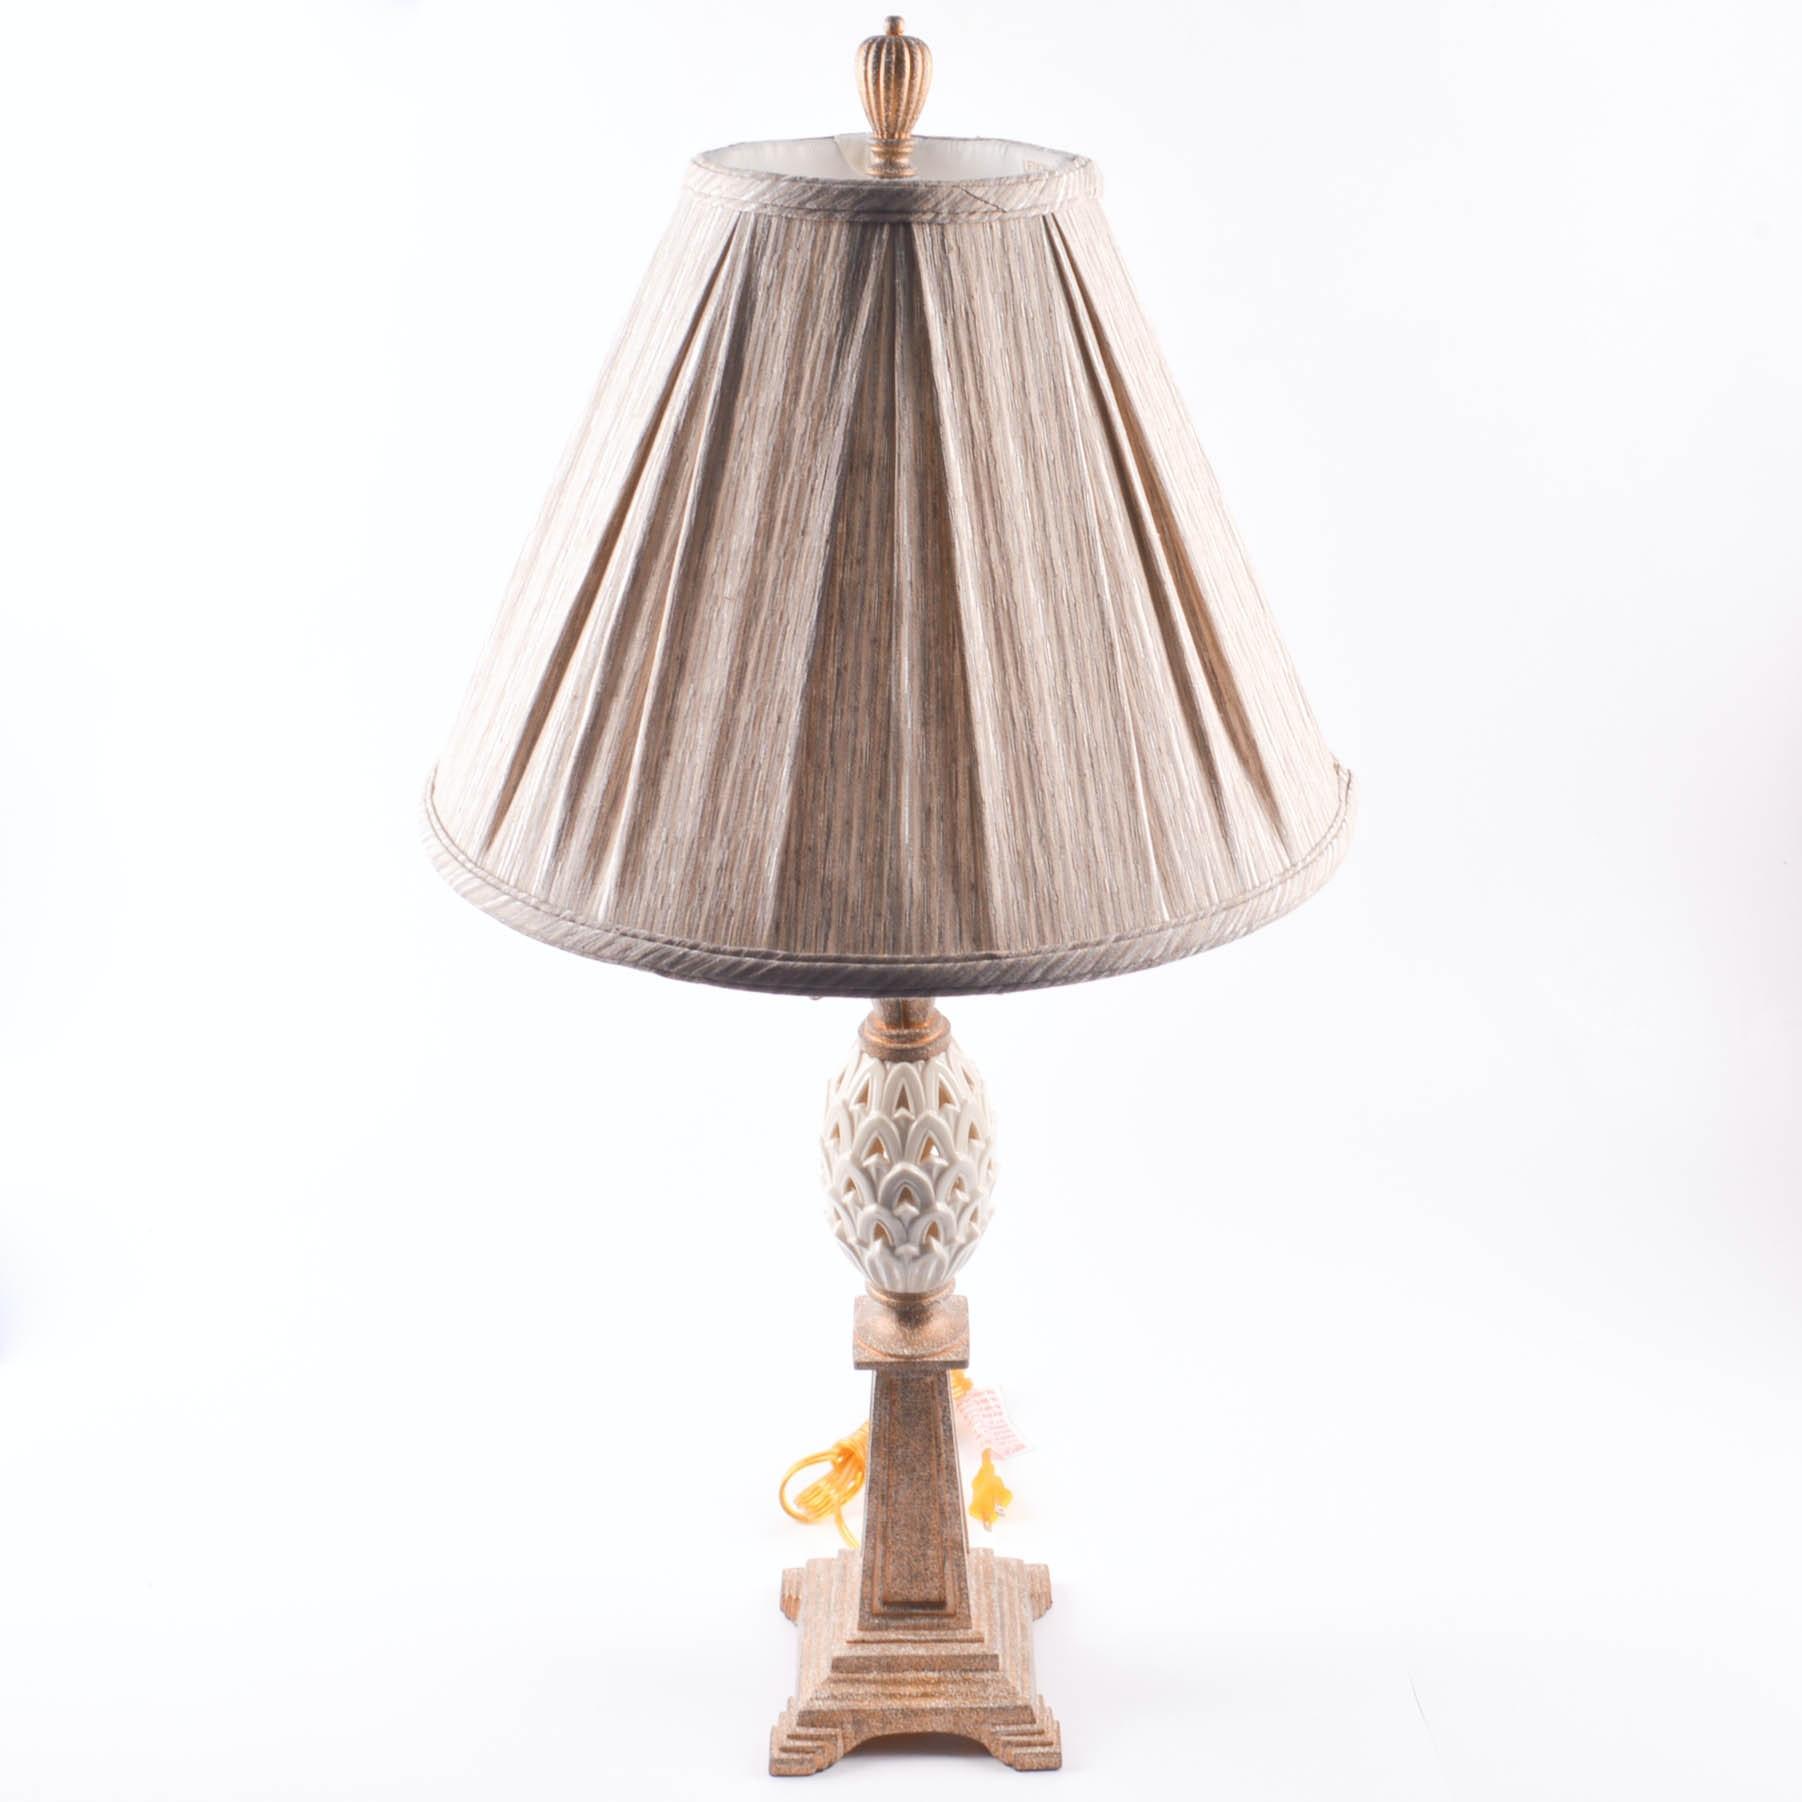 Lenox Quoizel Pineapple Lamp Ebth